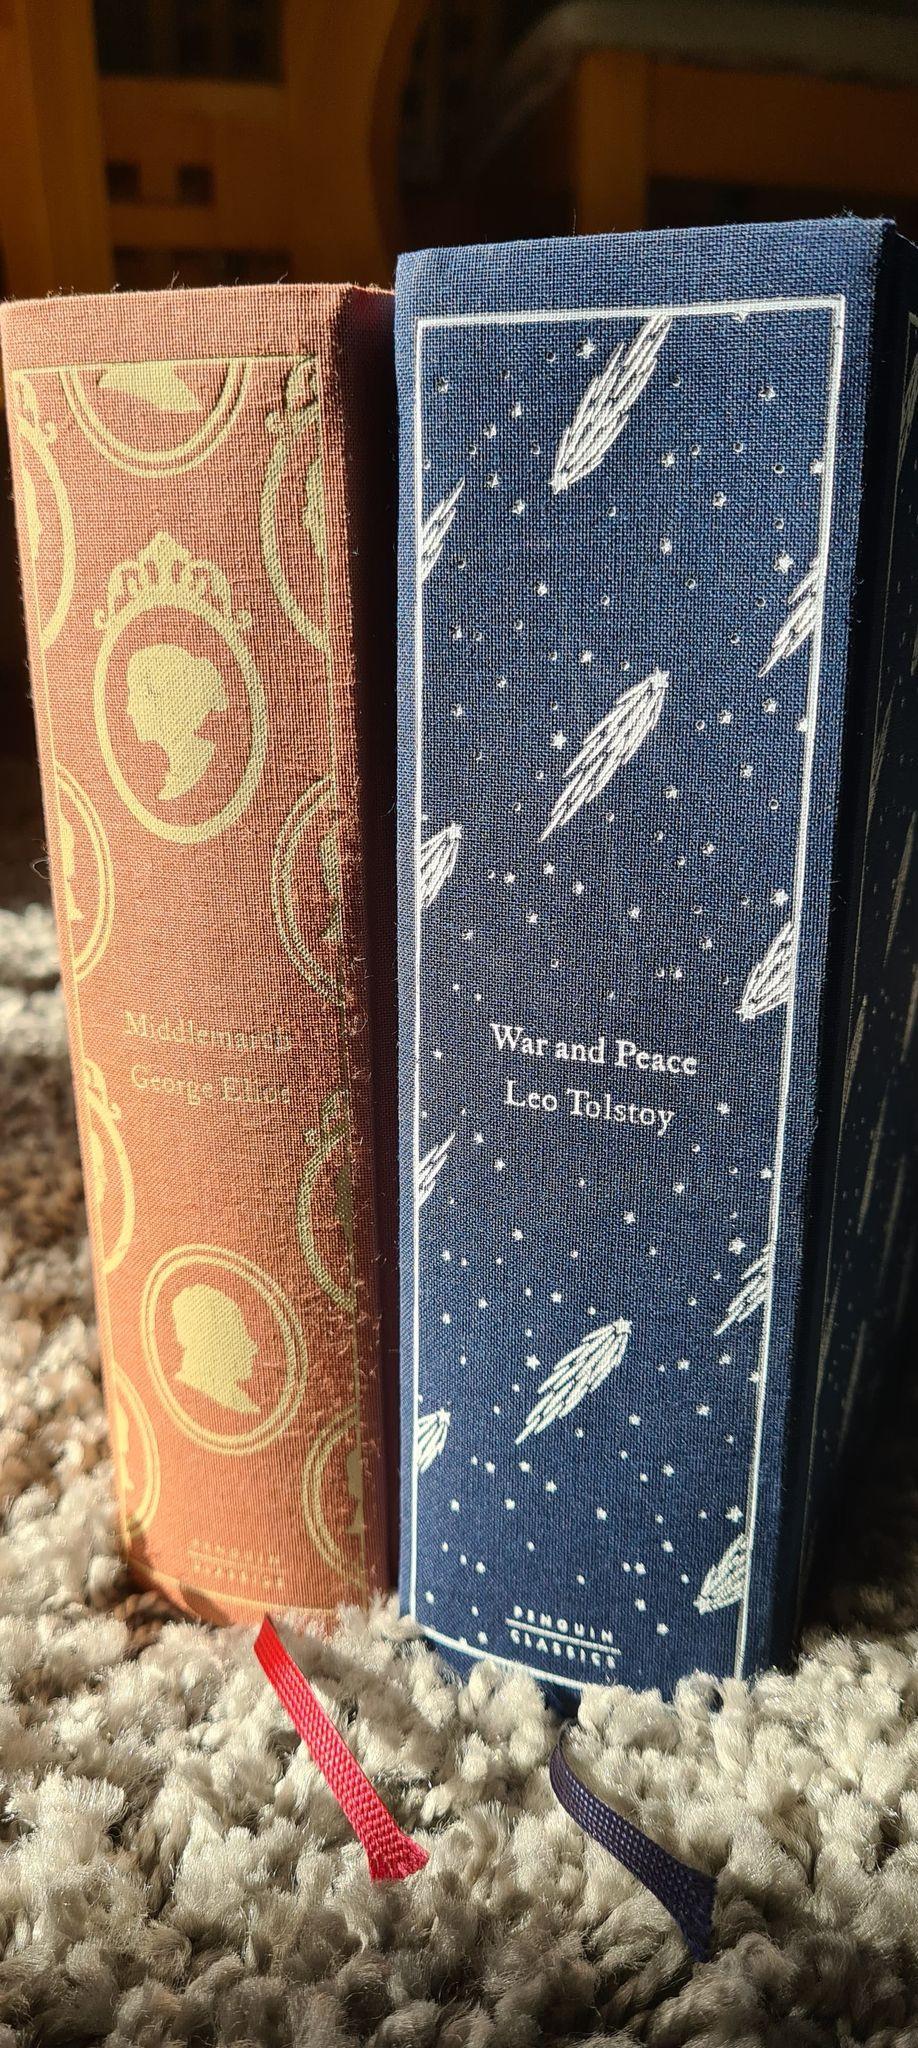 Hannah's Penguin Clothbound Classics